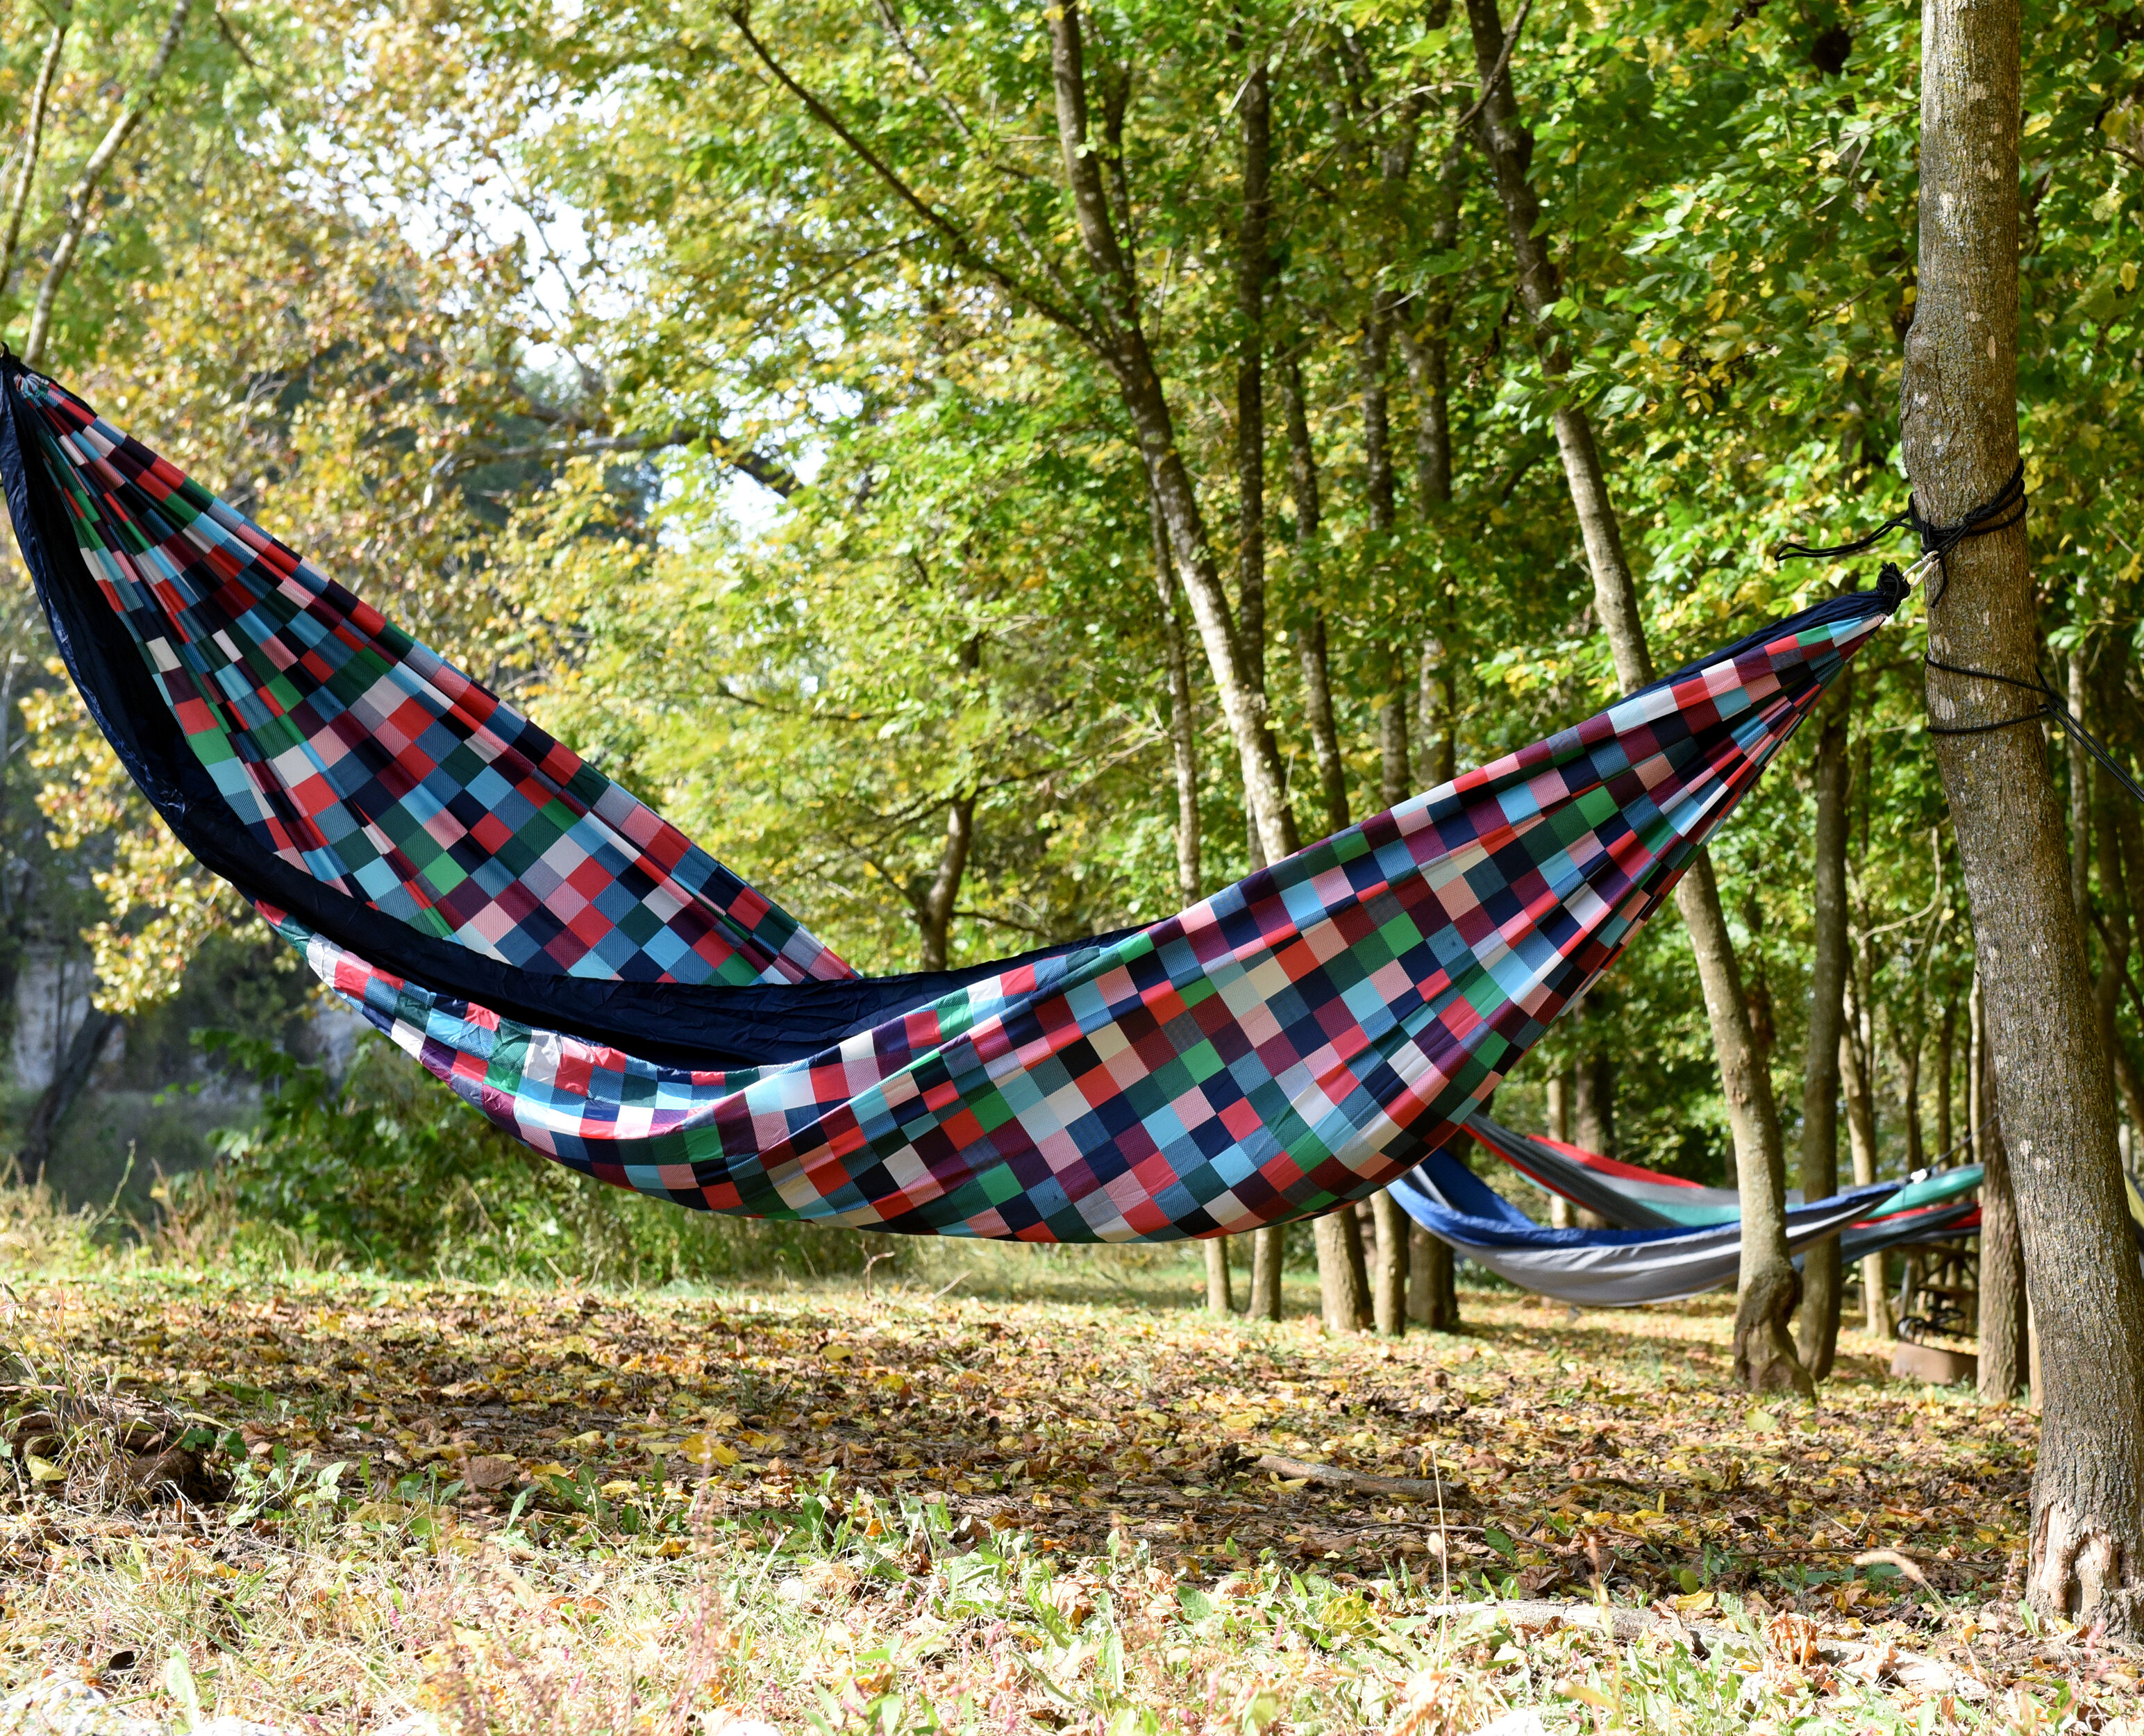 c hammocks hammock products beach and camp hiking camping travel furniture lounge en